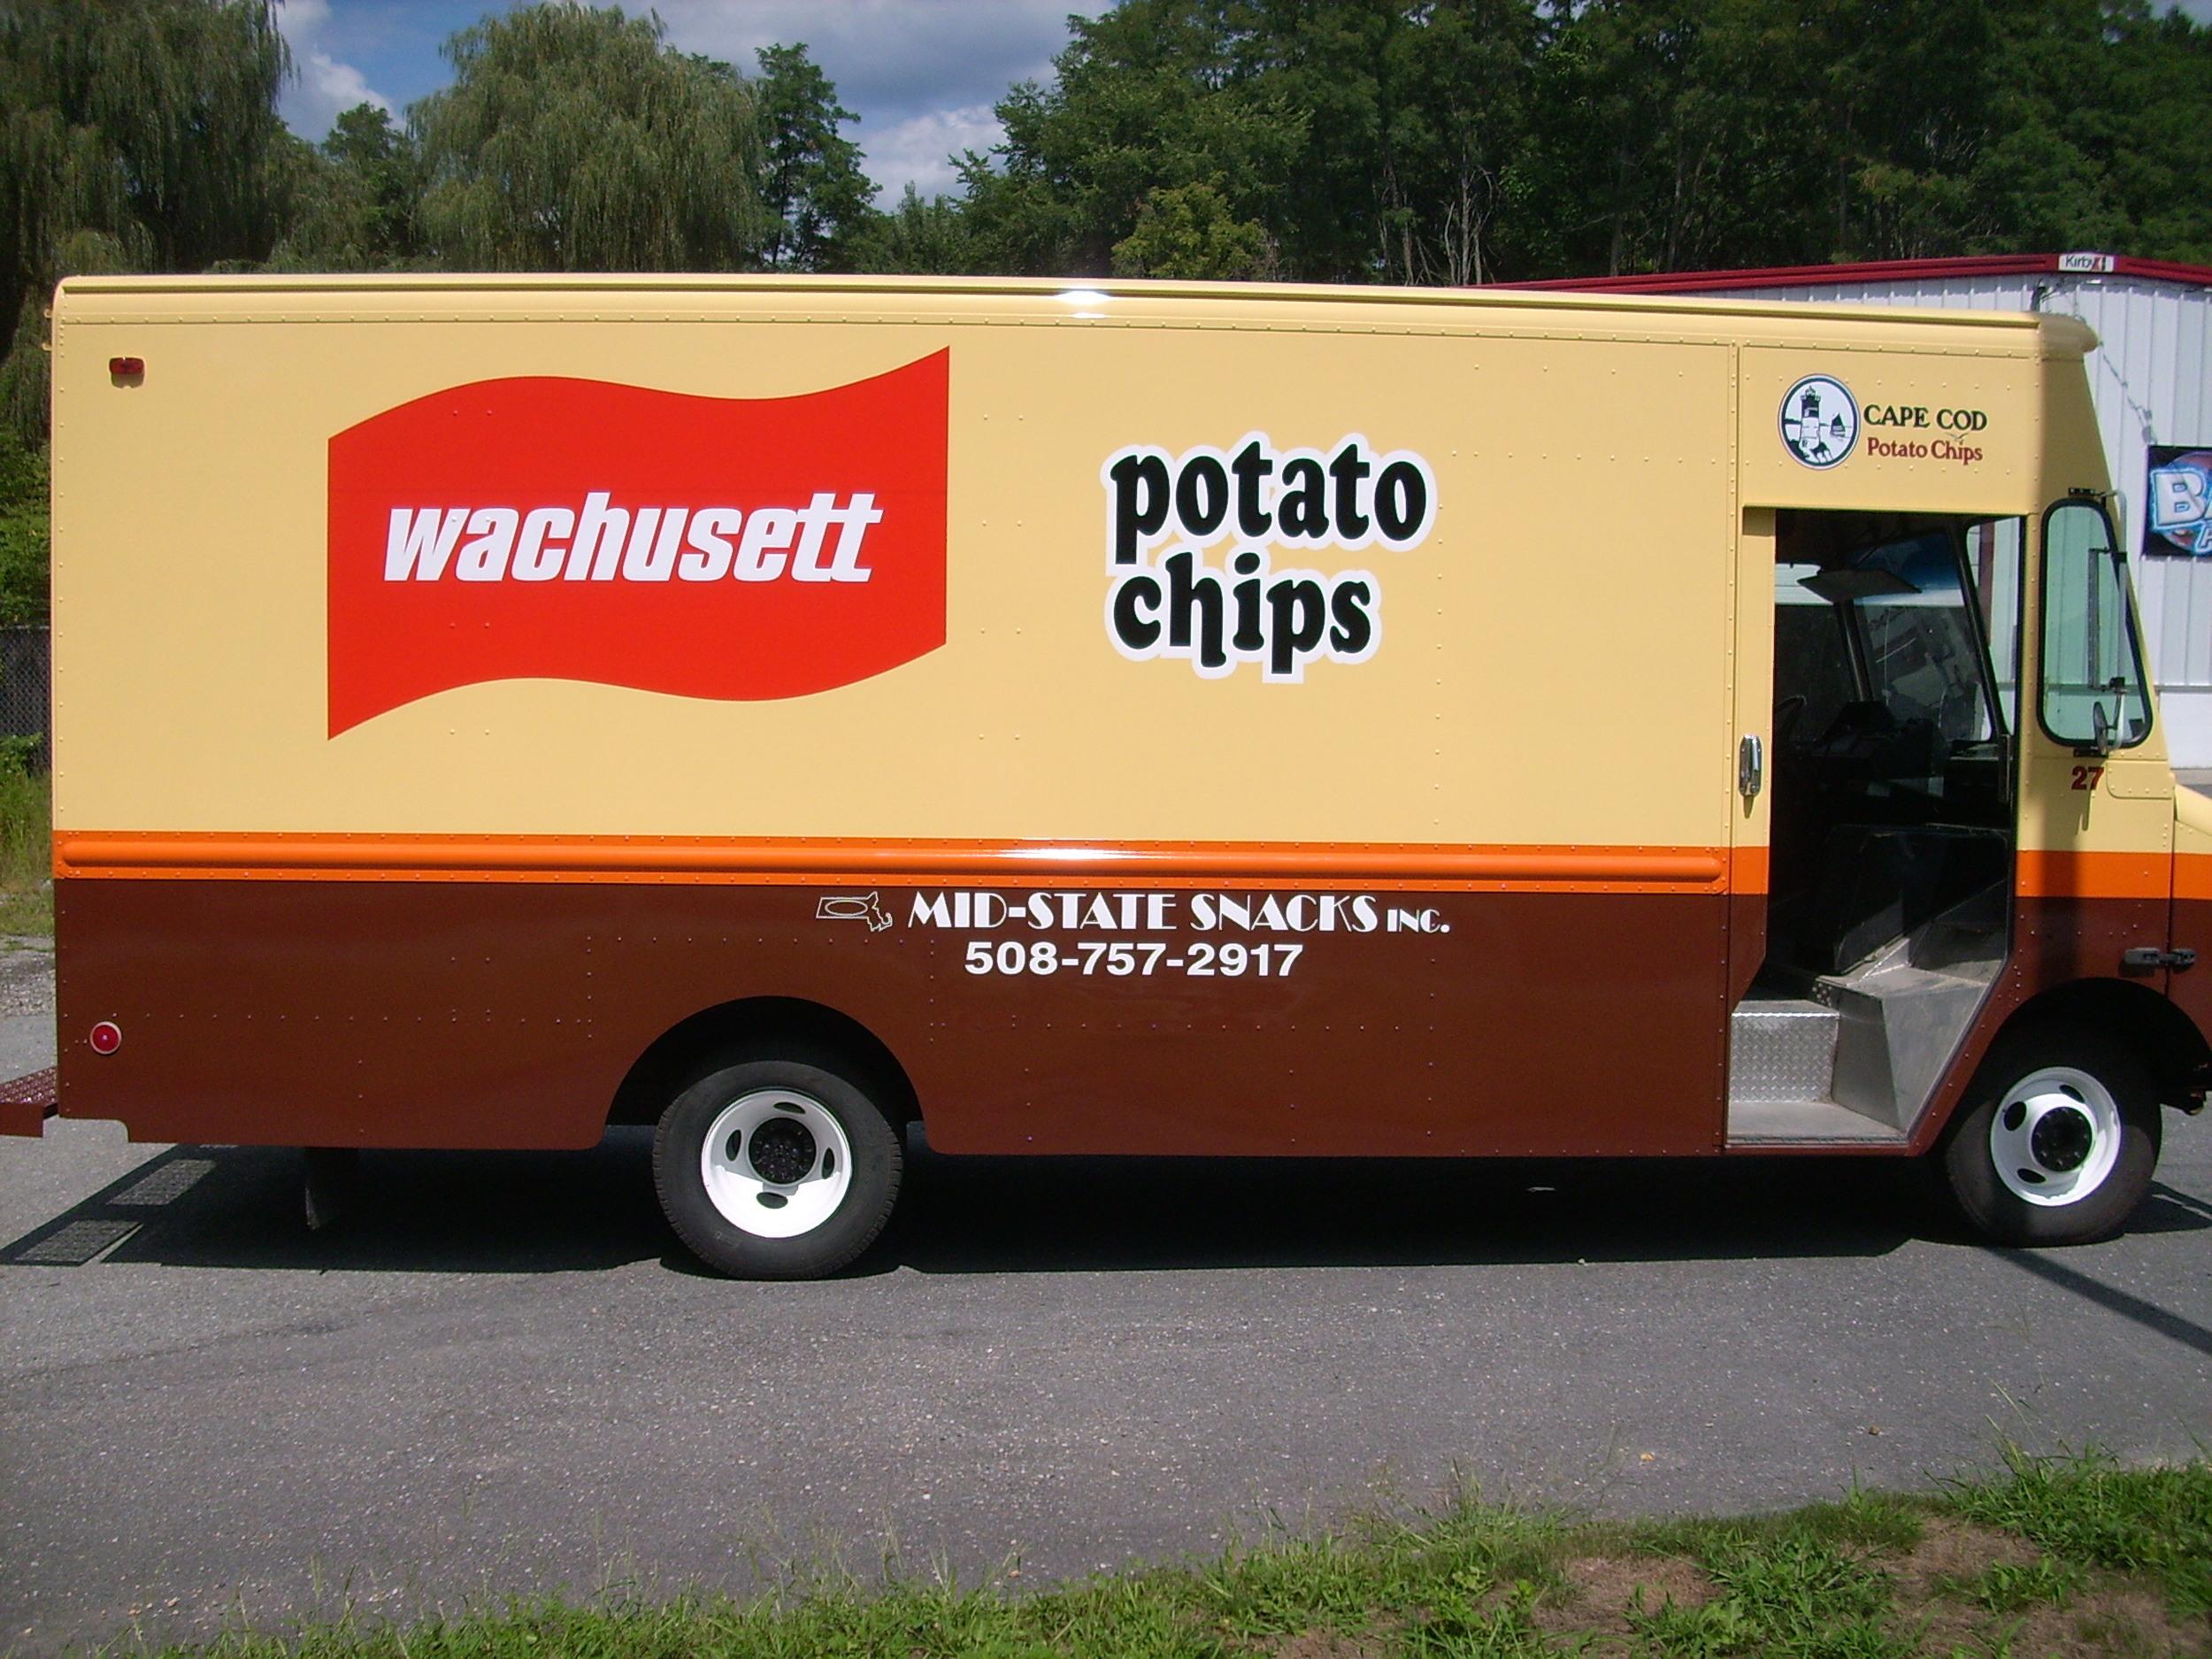 Wachusett Potato Chips Truck.JPG